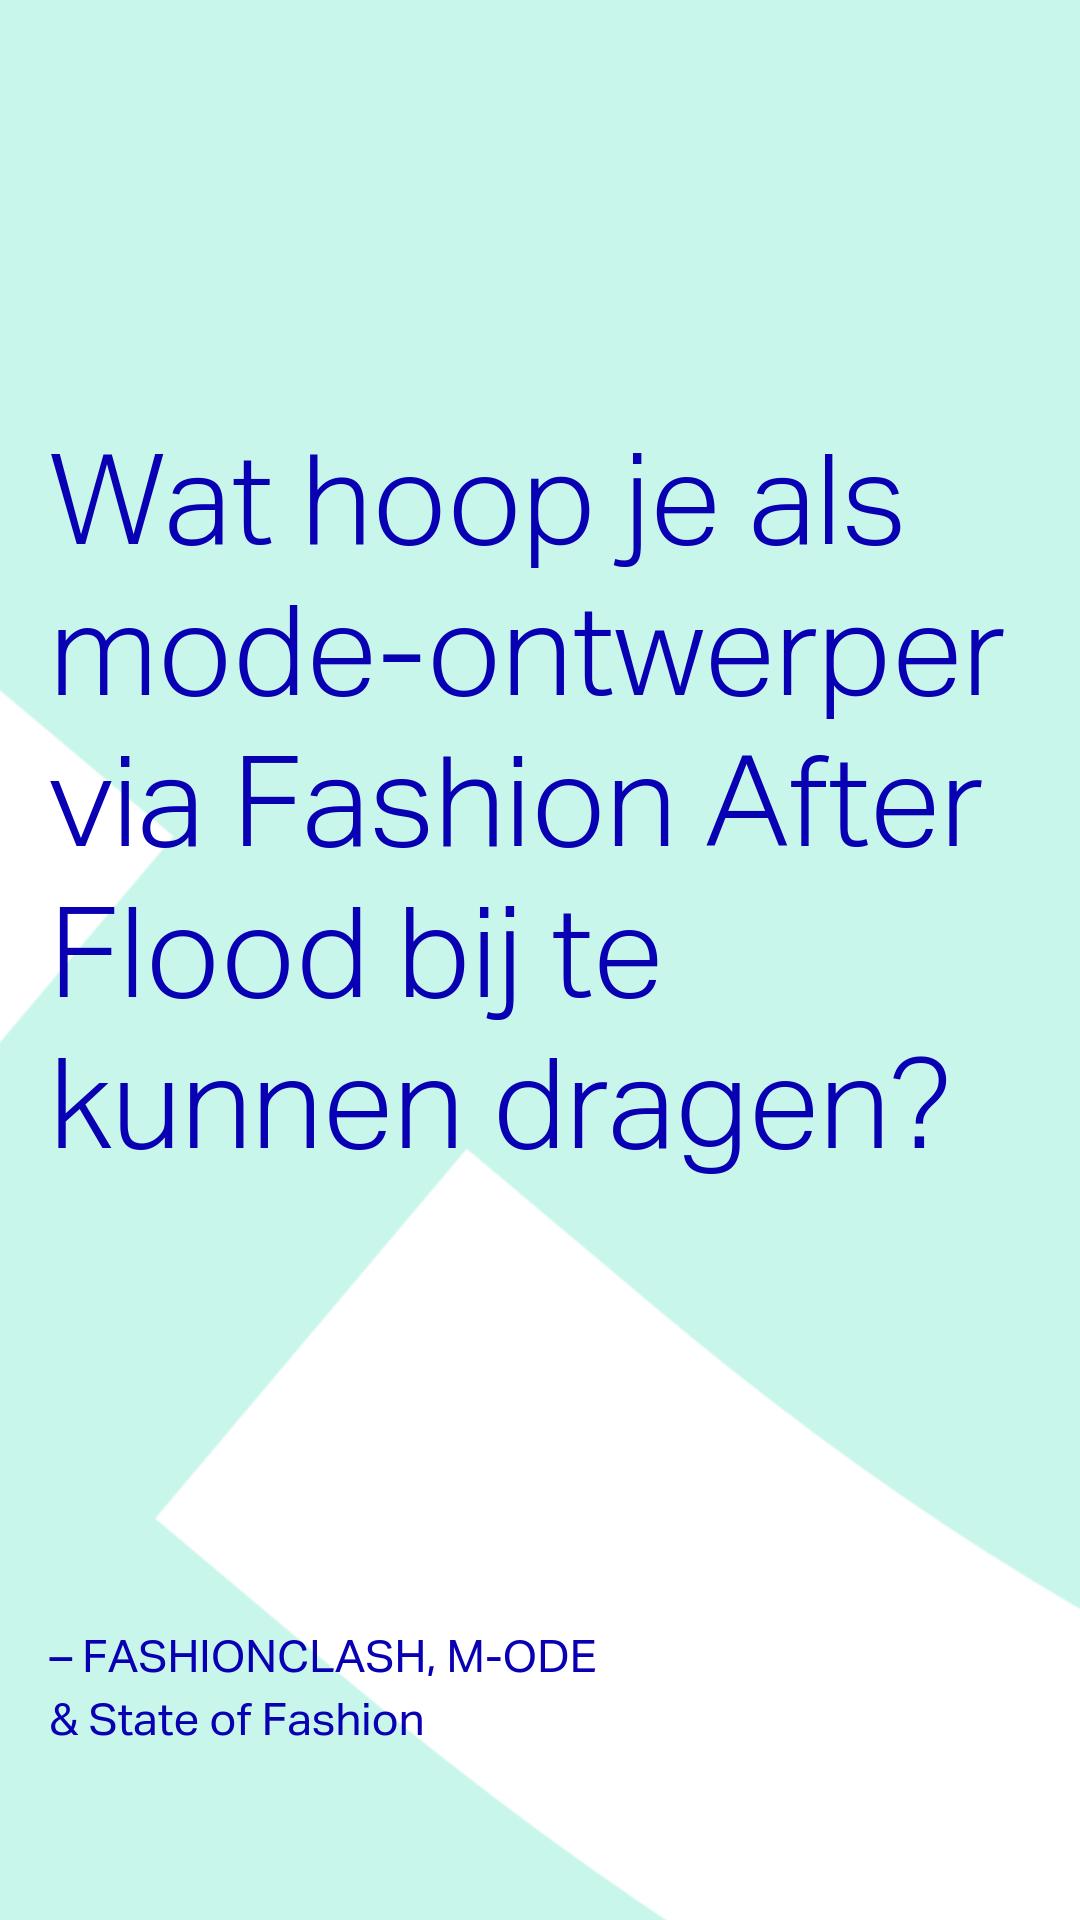 Taskforce-fashion-fashion-after-flood-kennismaking-algemeen4.png